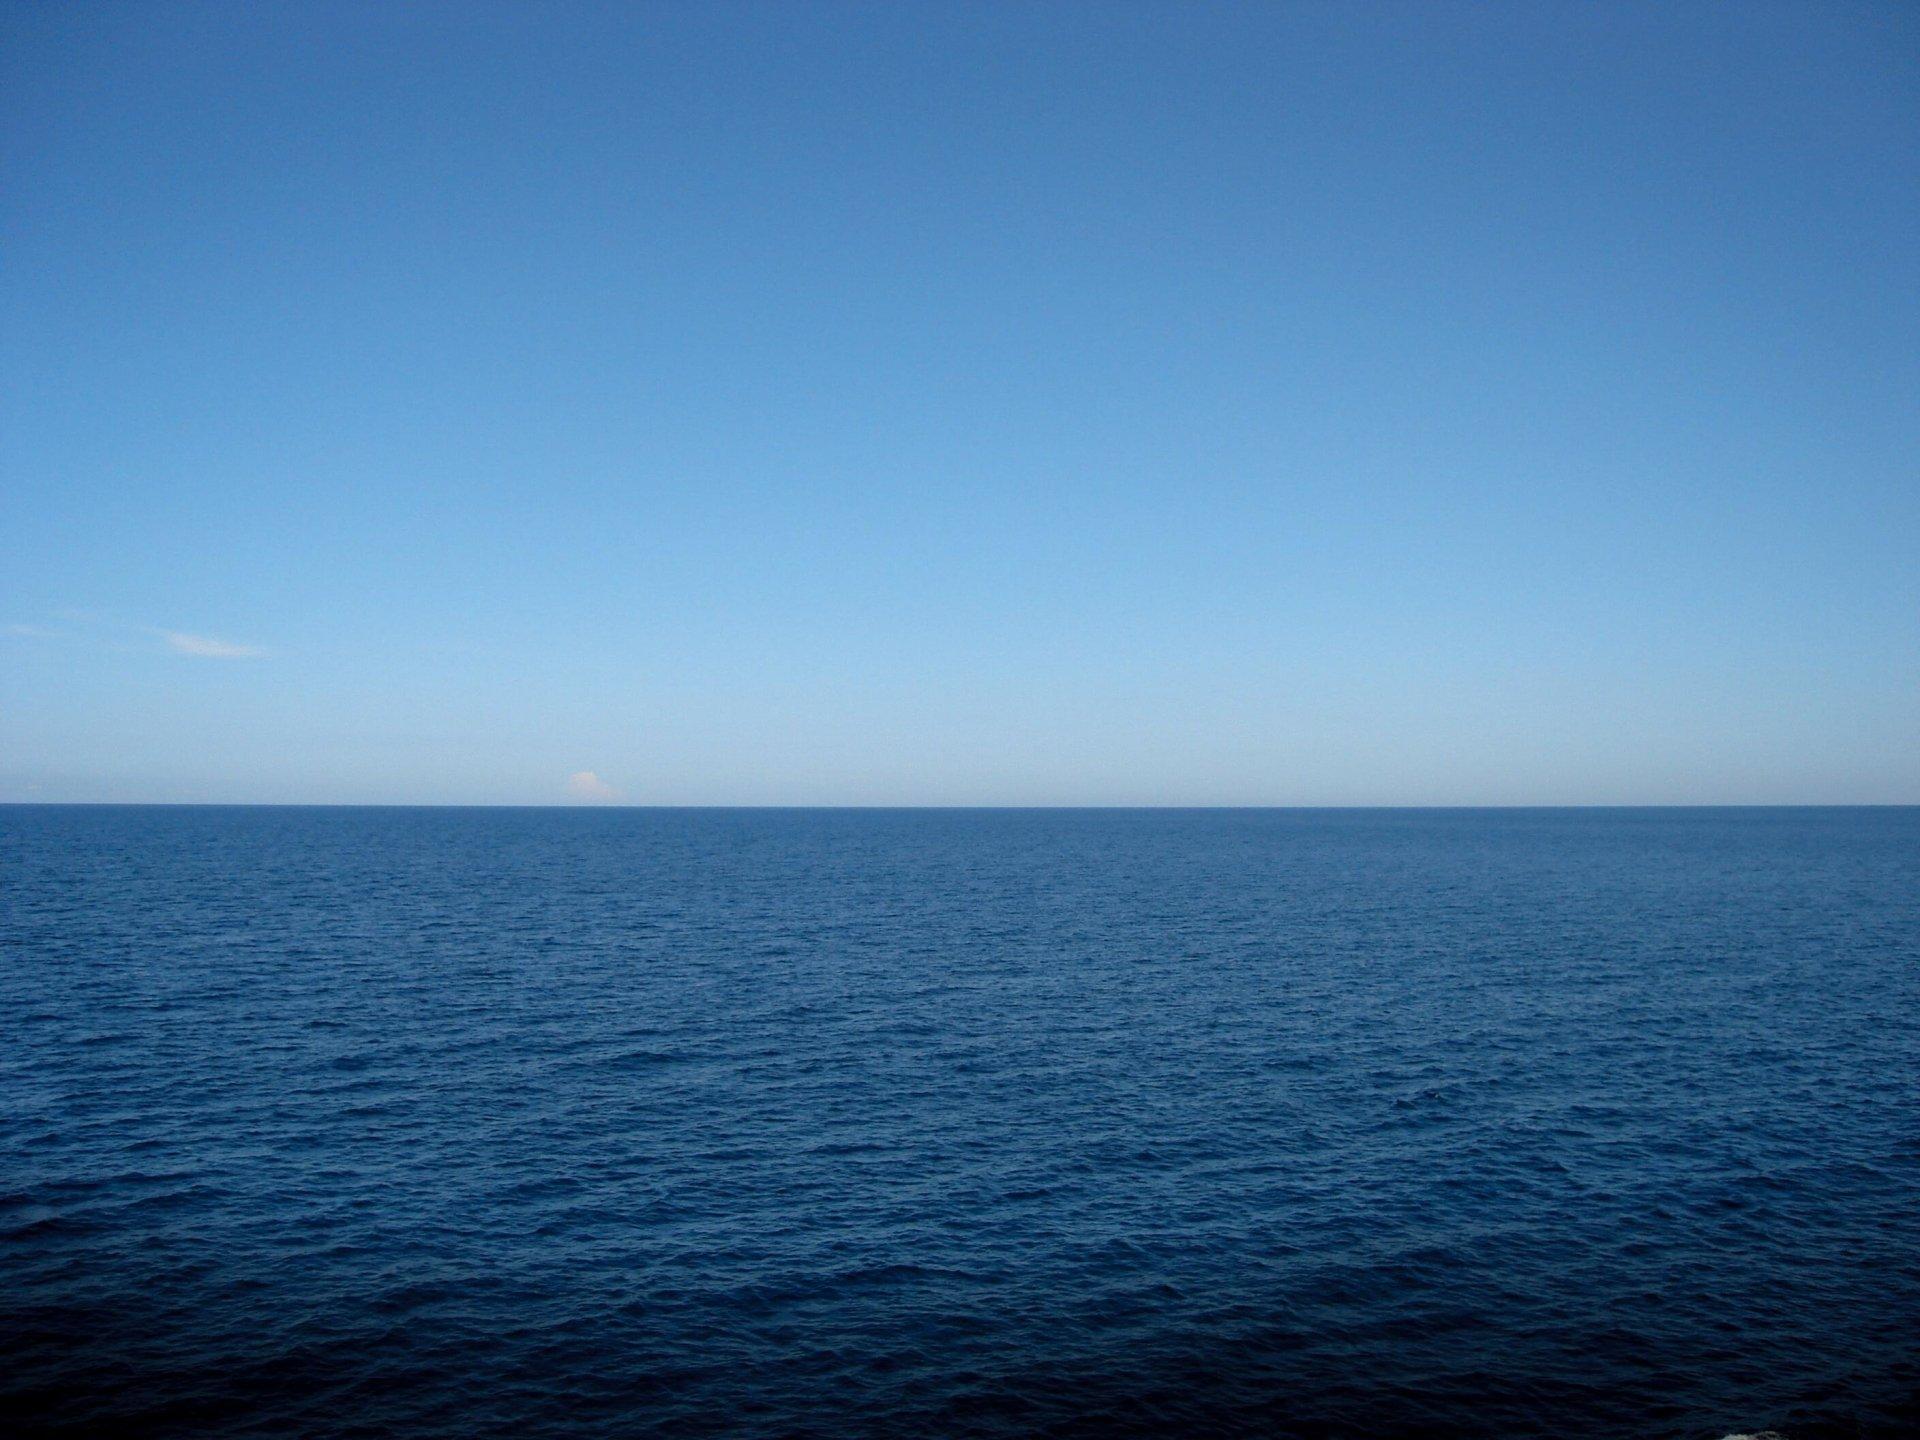 Earth - Ocean  Wallpaper